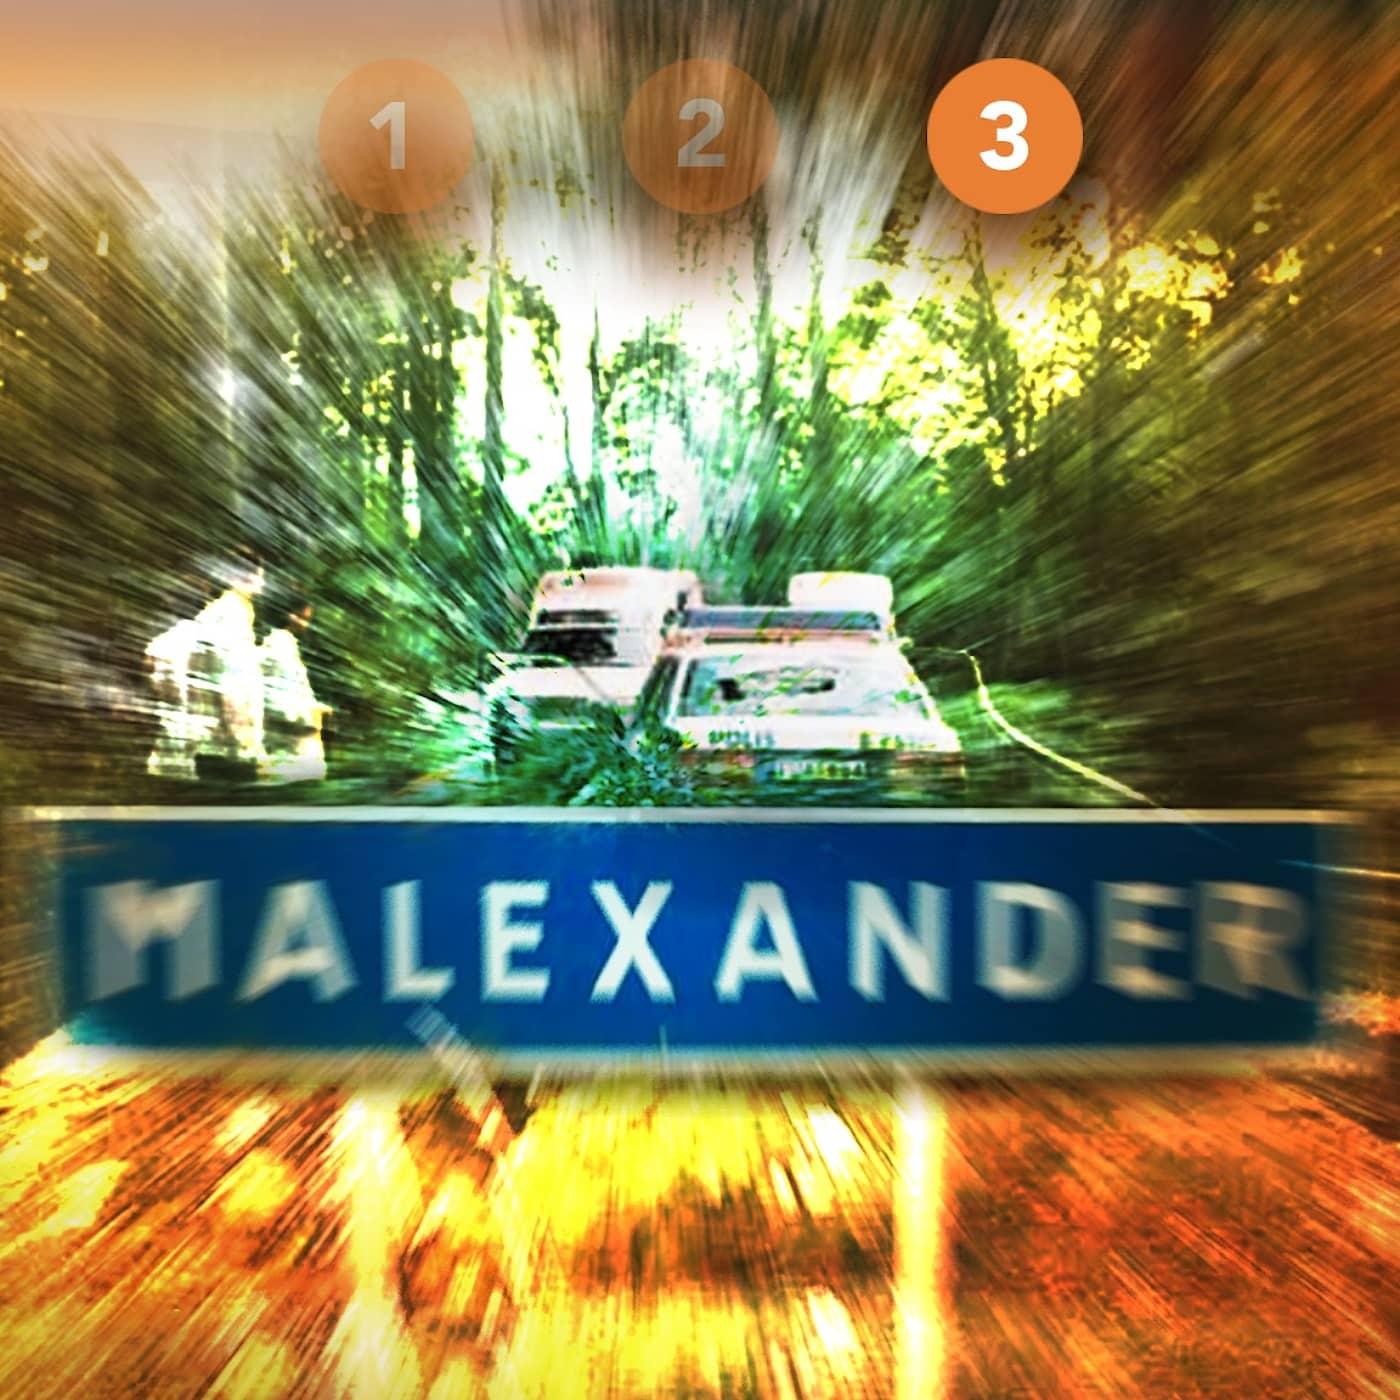 Malexander: Min bror Tony Olsson